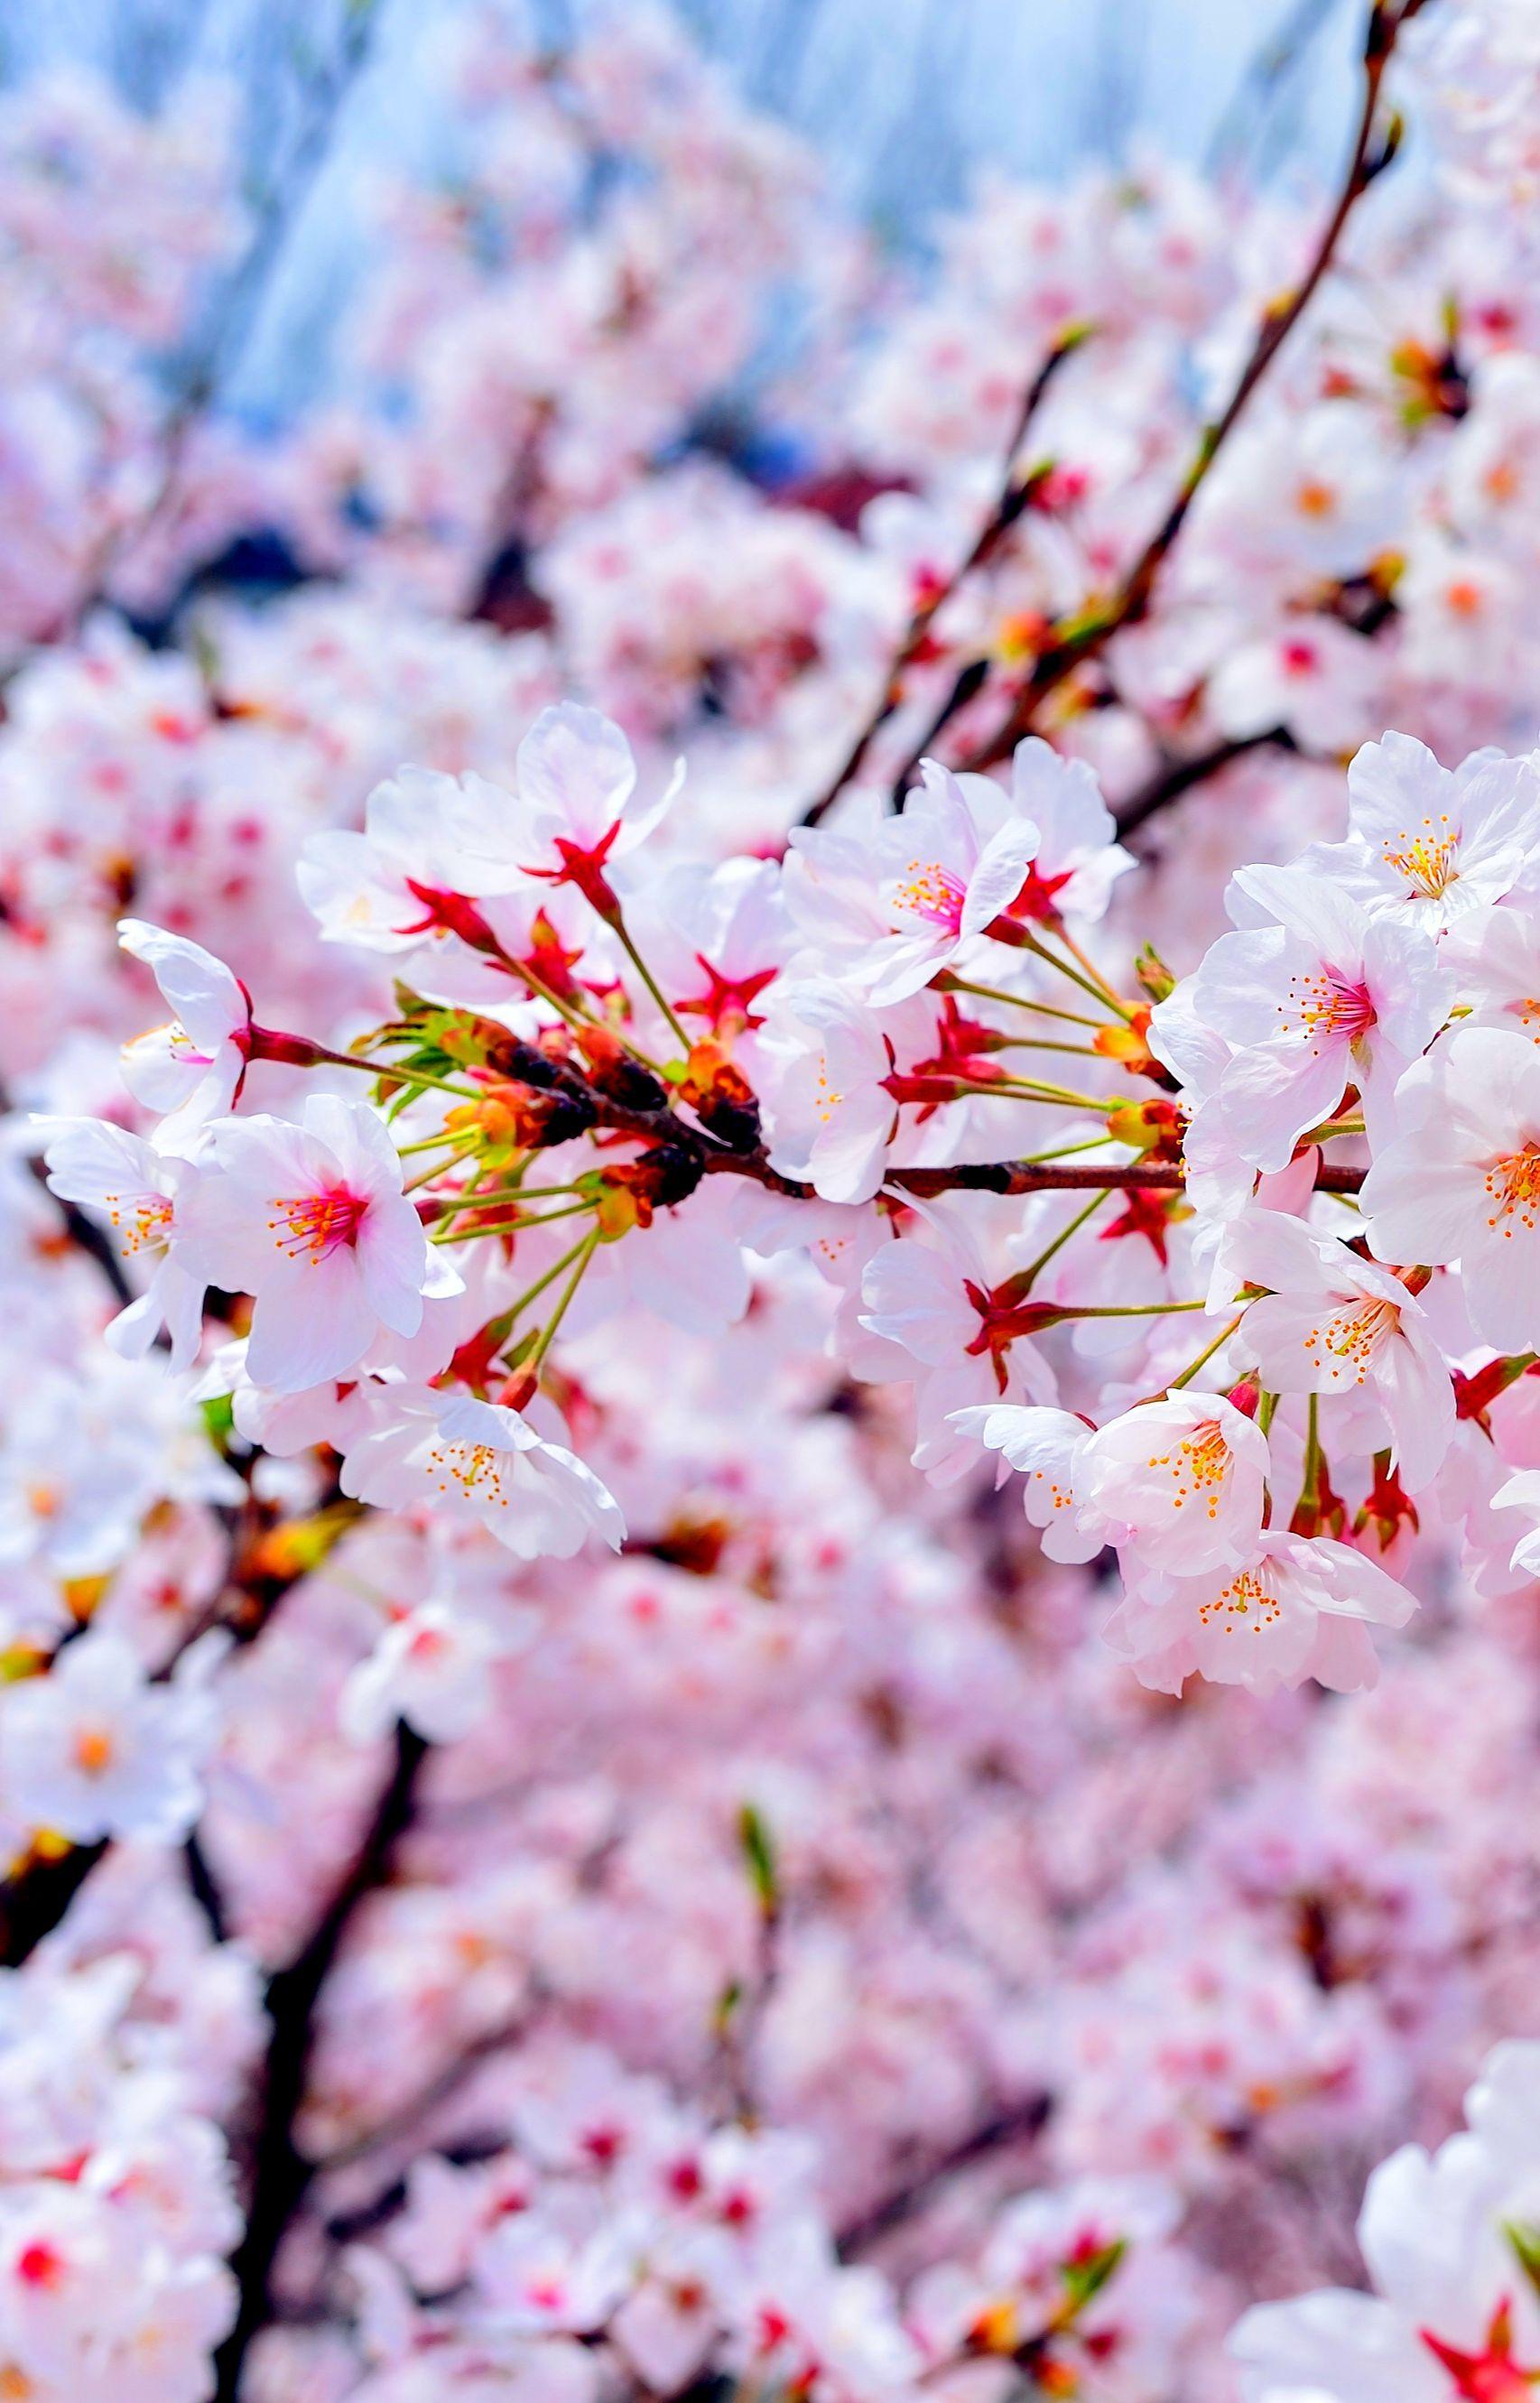 Cherry Blossom Kyoto Cherry Blossom Japan Japanese Nature Spring Wallpaper